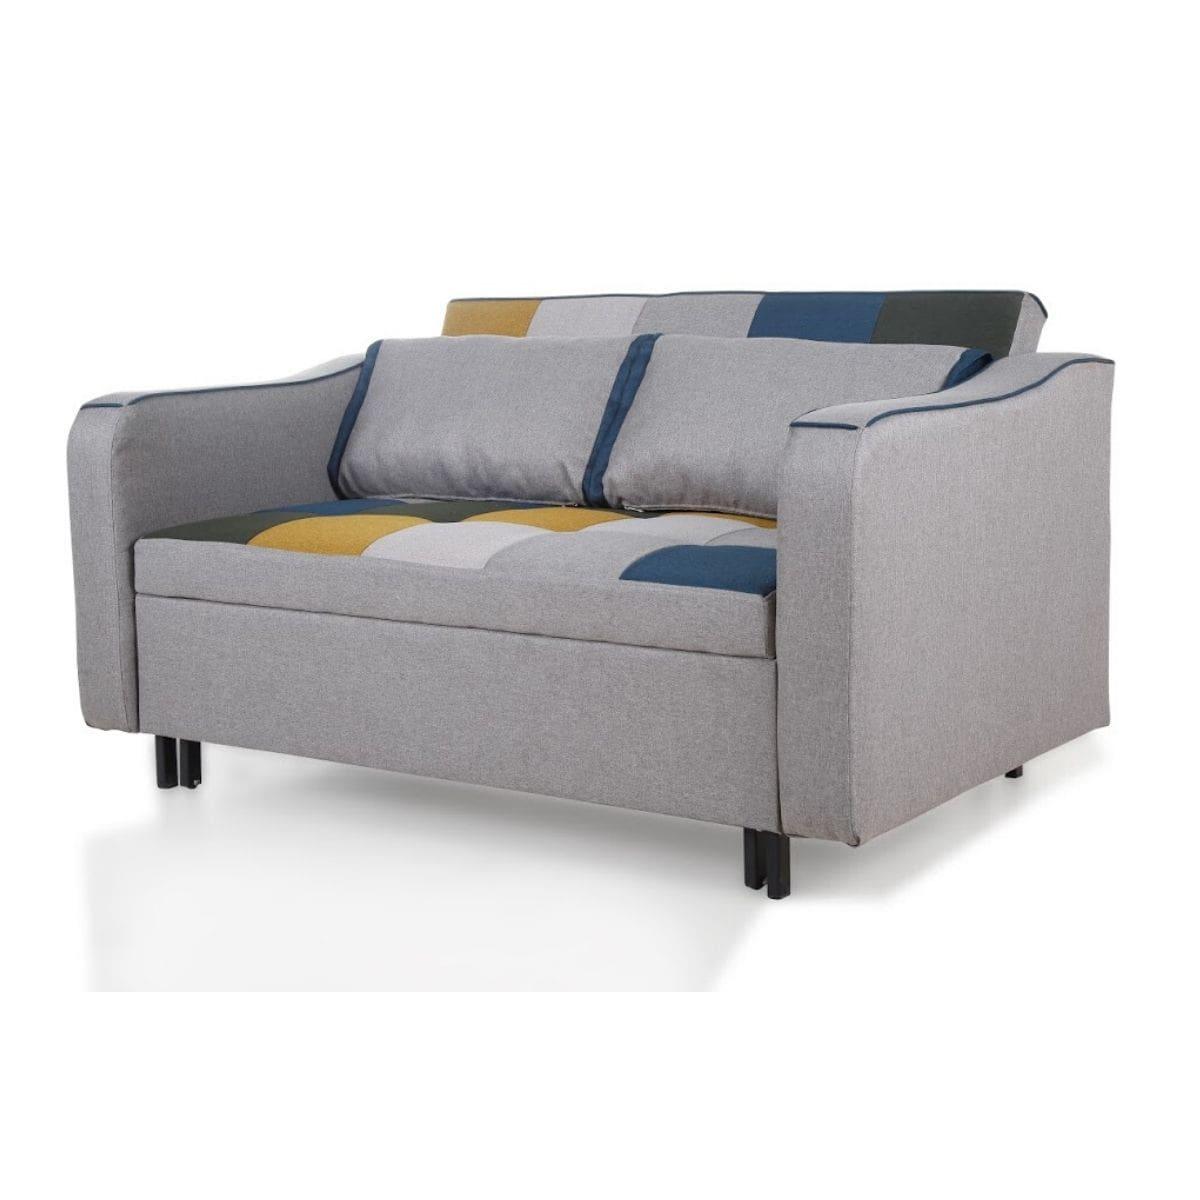 Aidan Sofa Bed   Corcorans Furniture & Carpets